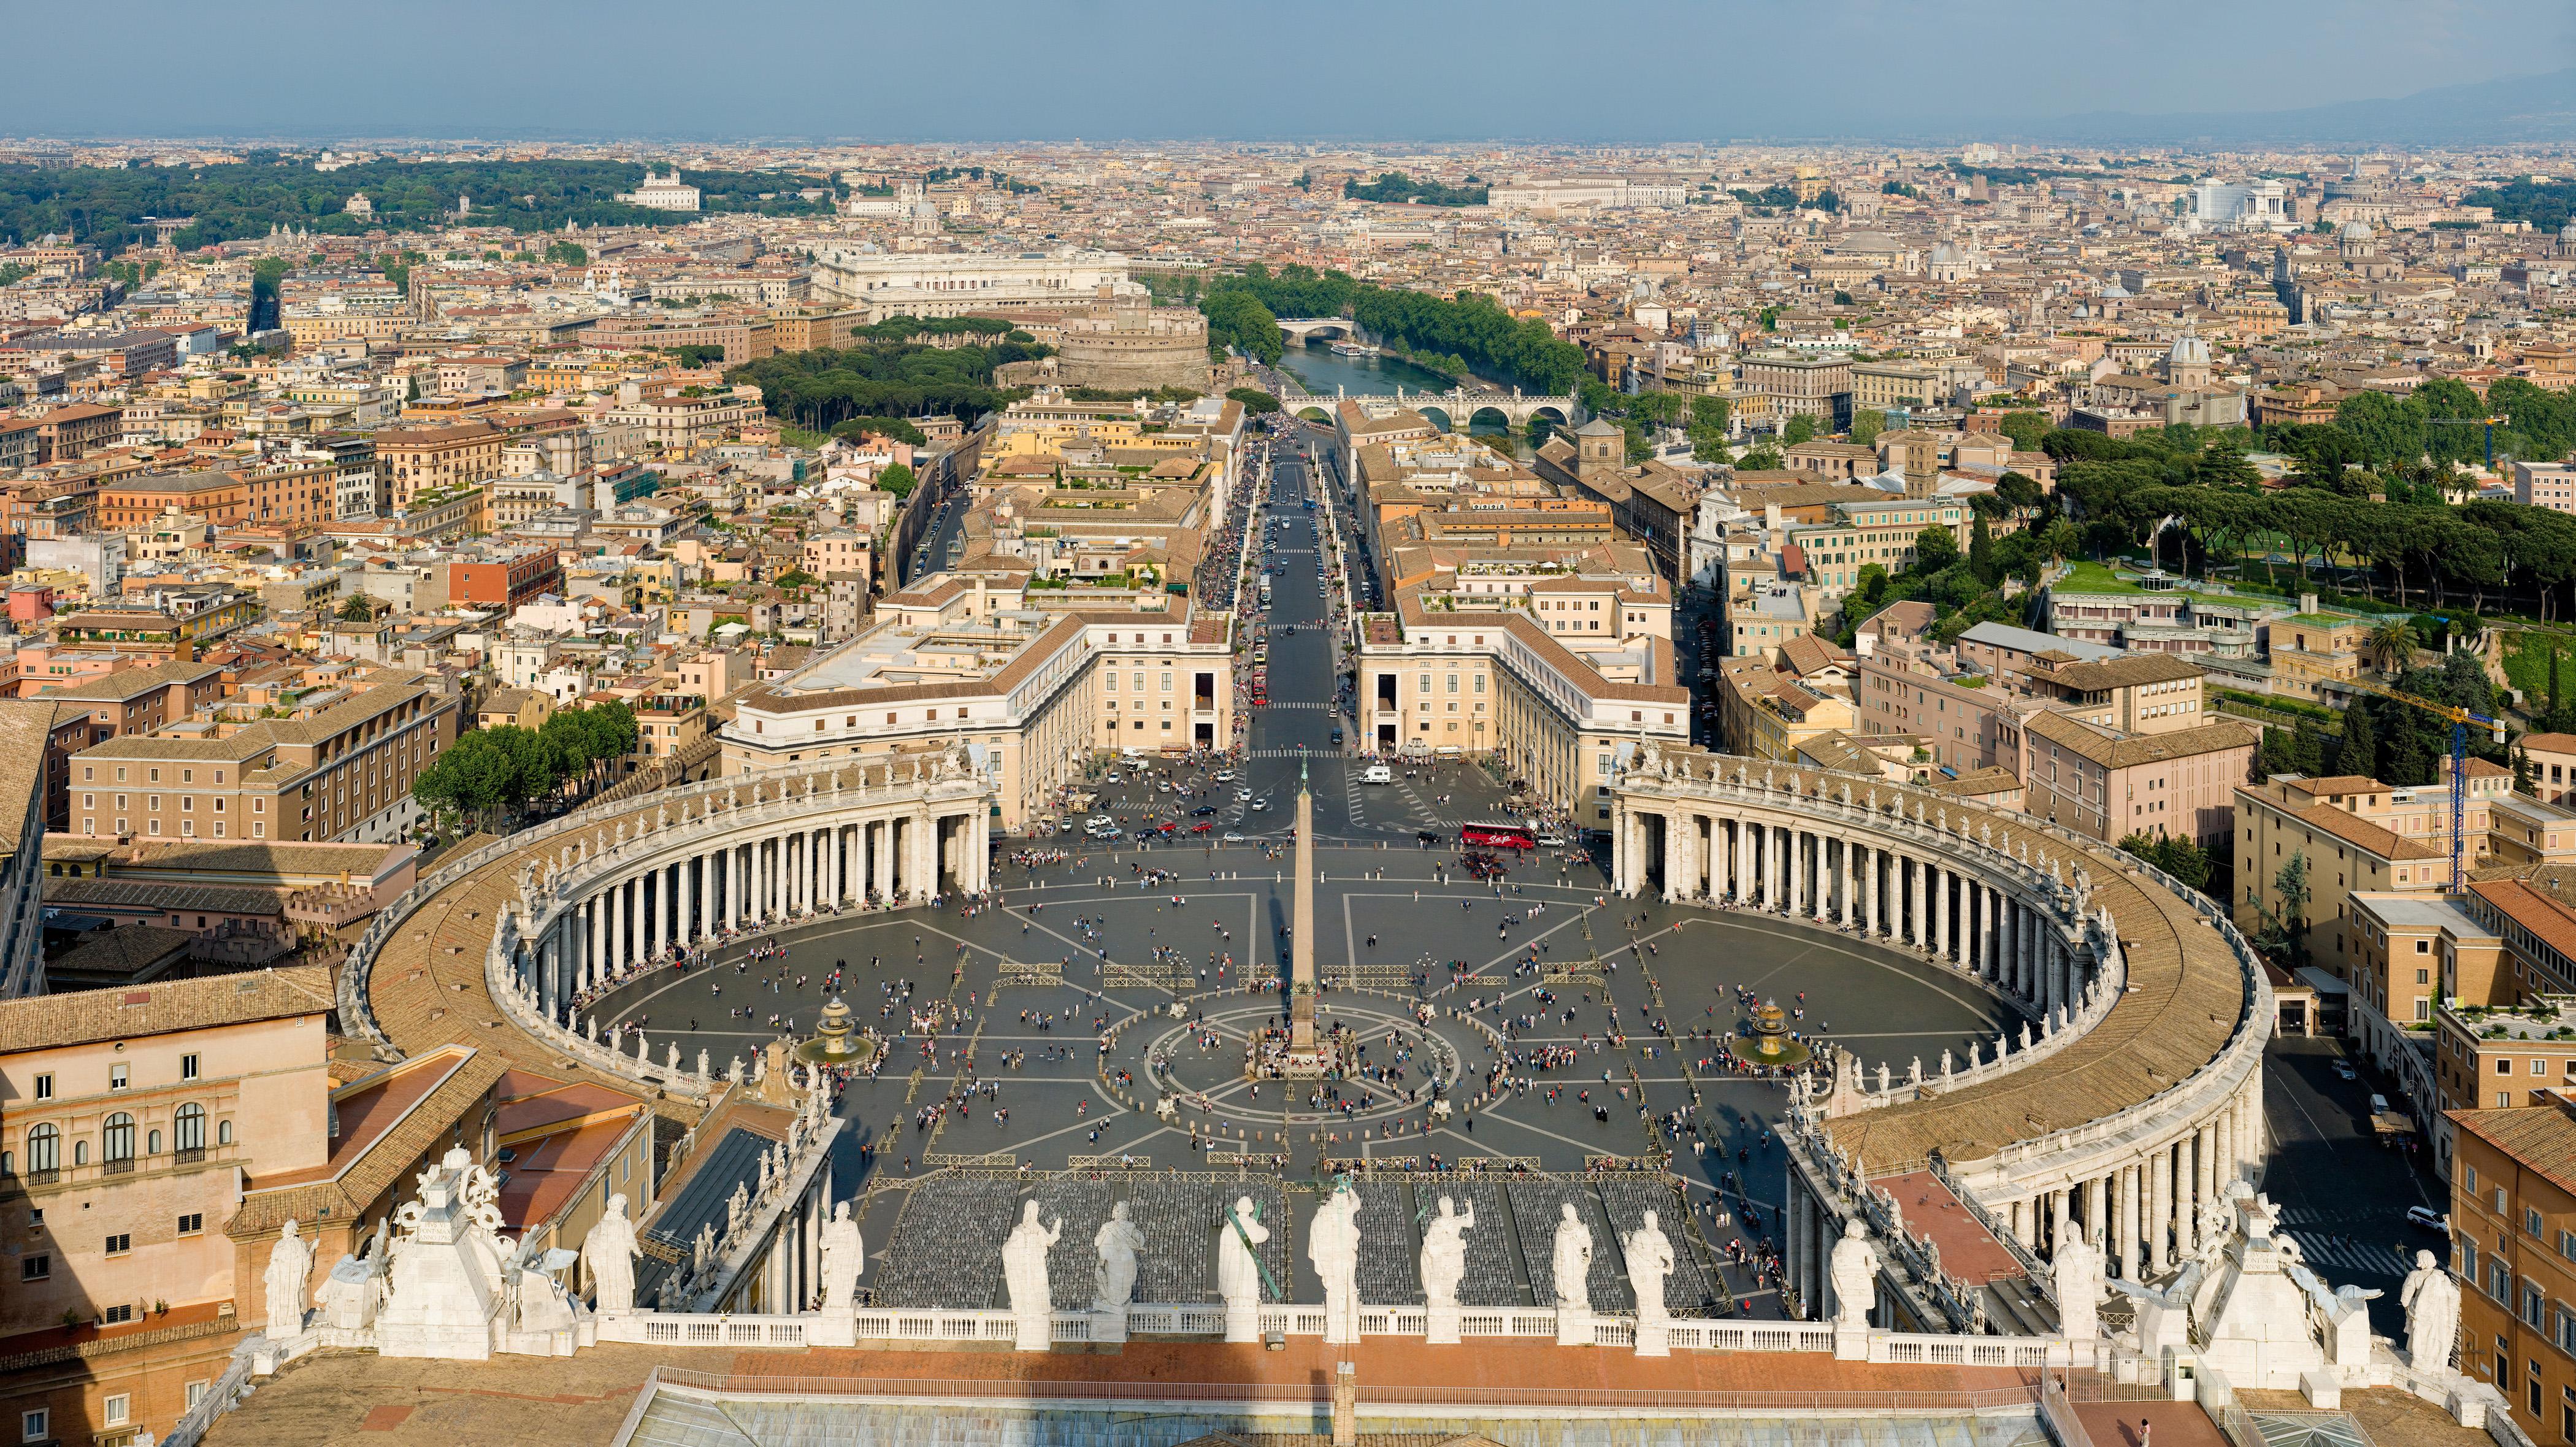 St. Peter's Square, Vatican City.